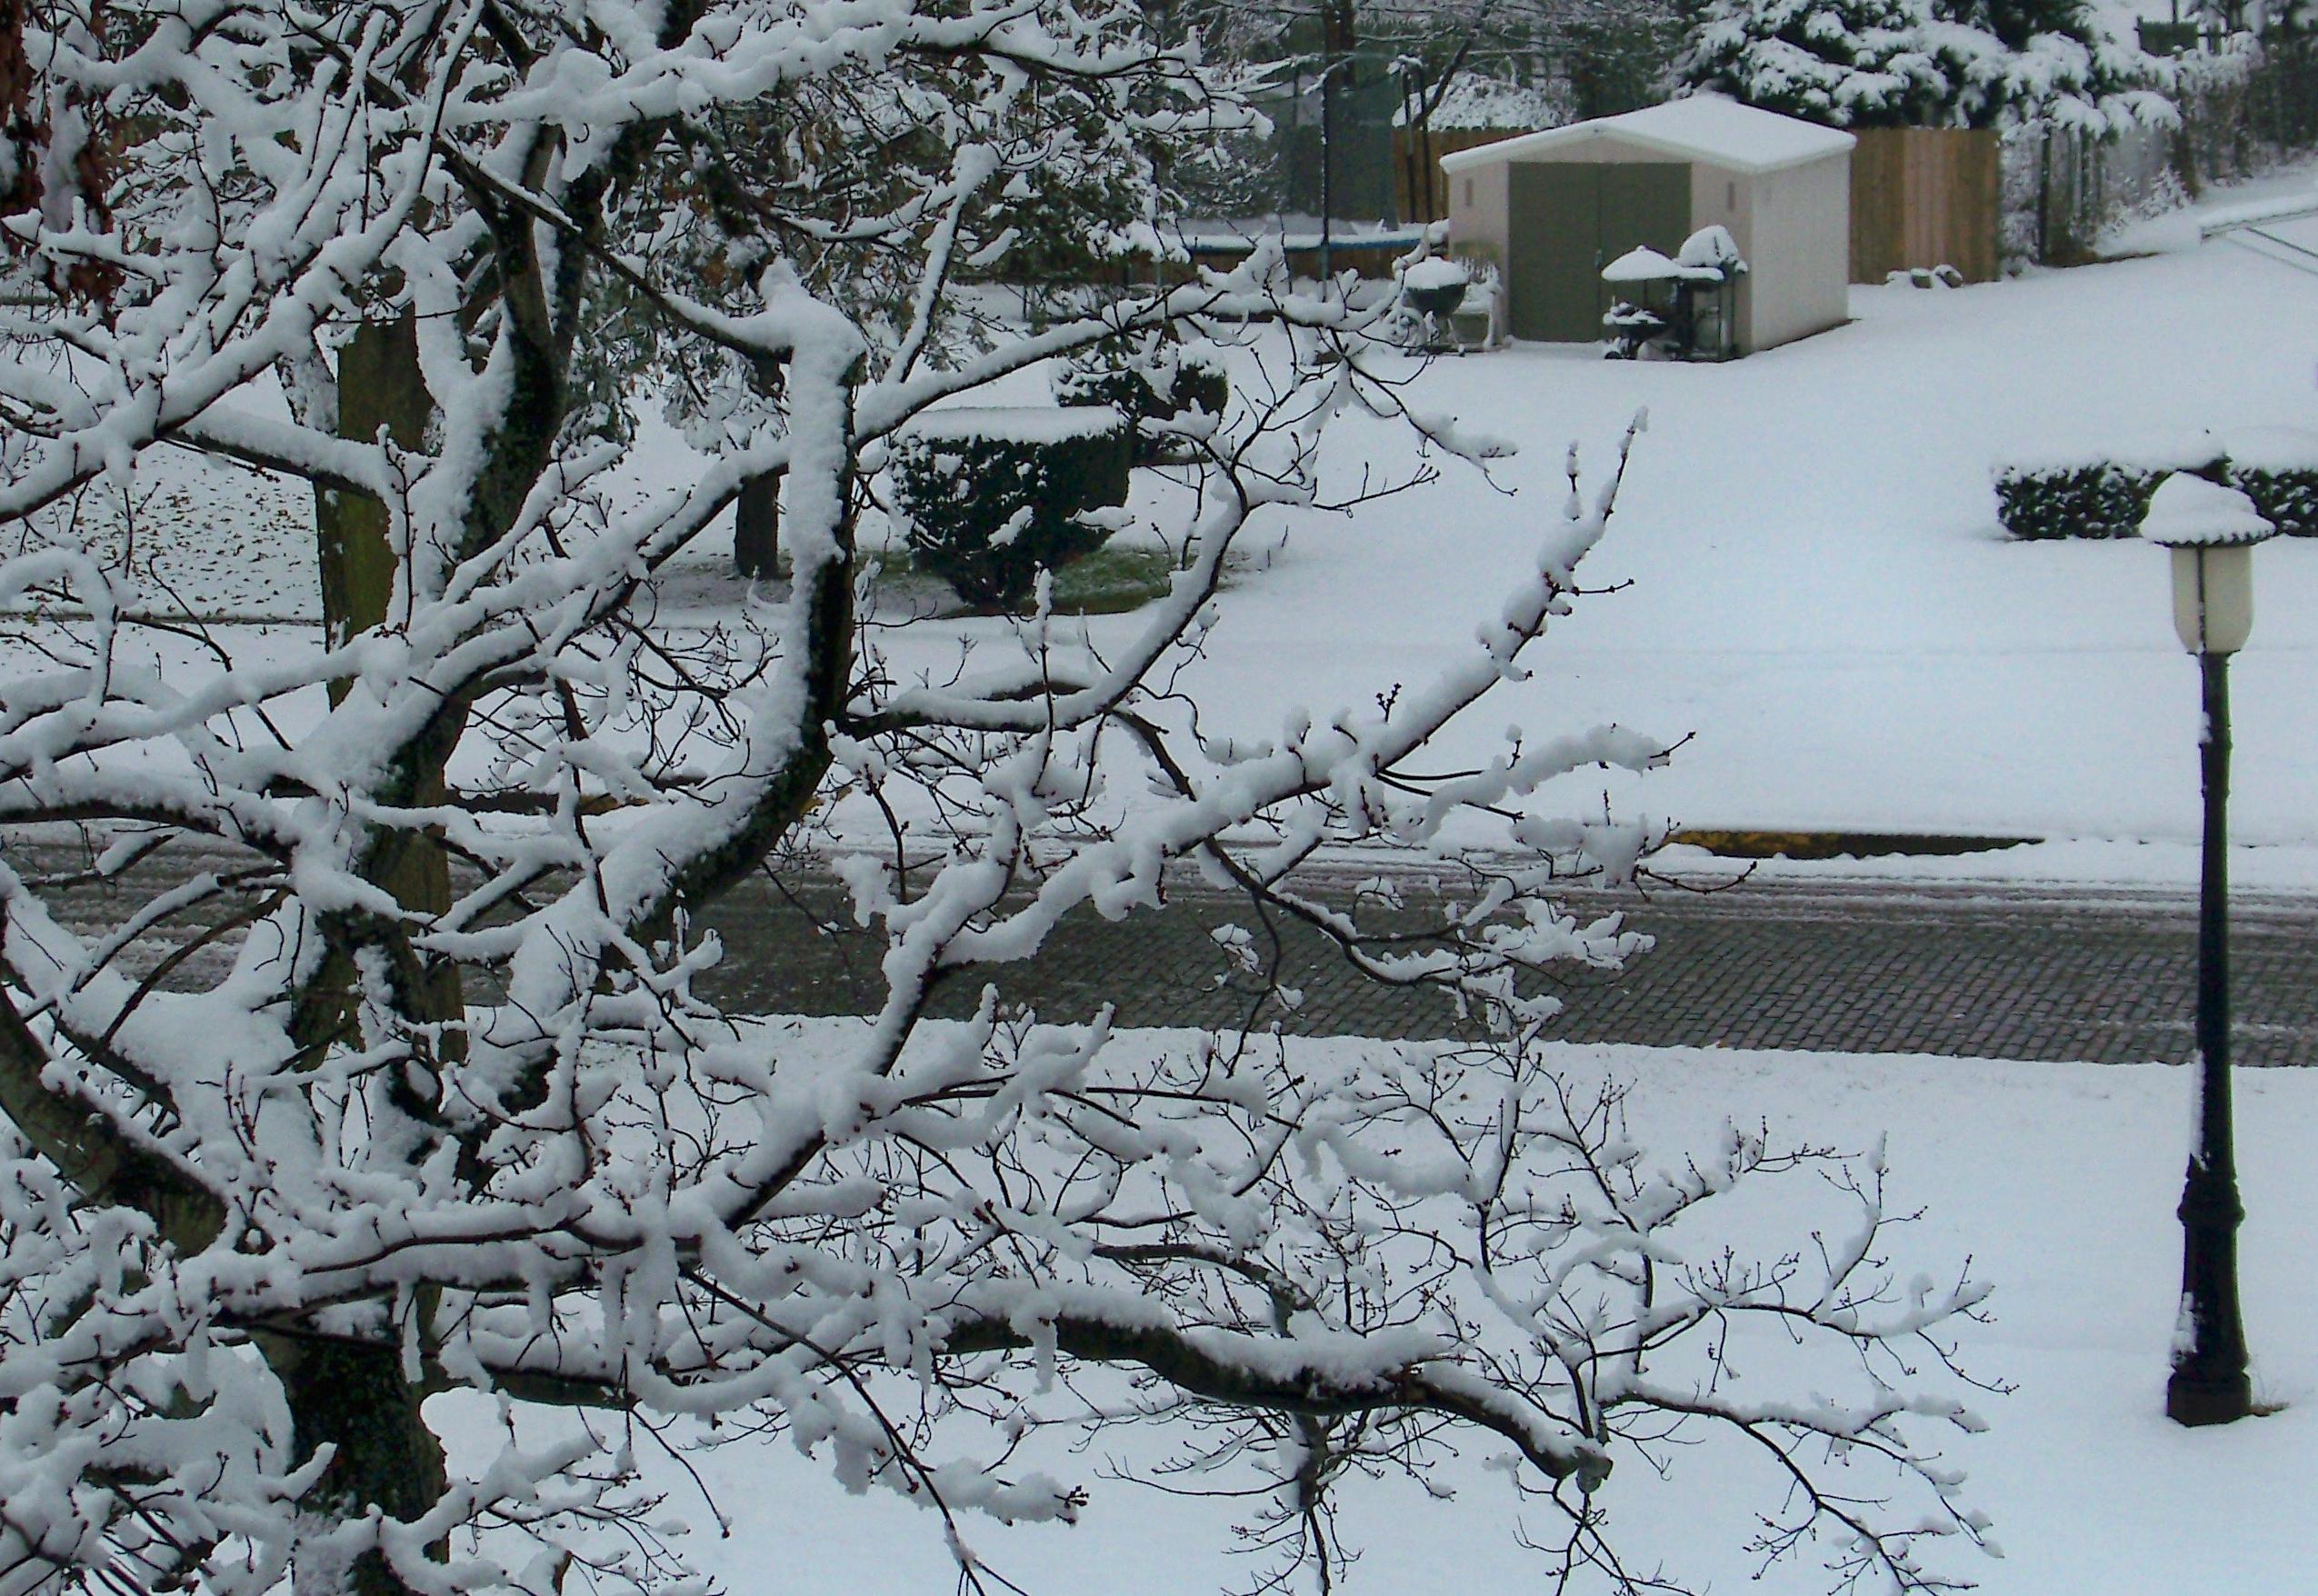 Illinois vermilion county muncie - November Usa Castle Illinois United Snowstorm Homer States Staaten Tatsunis Vereinigten Raycunningham Raymondcunningham Zaruka Raymondkcunninghamjr